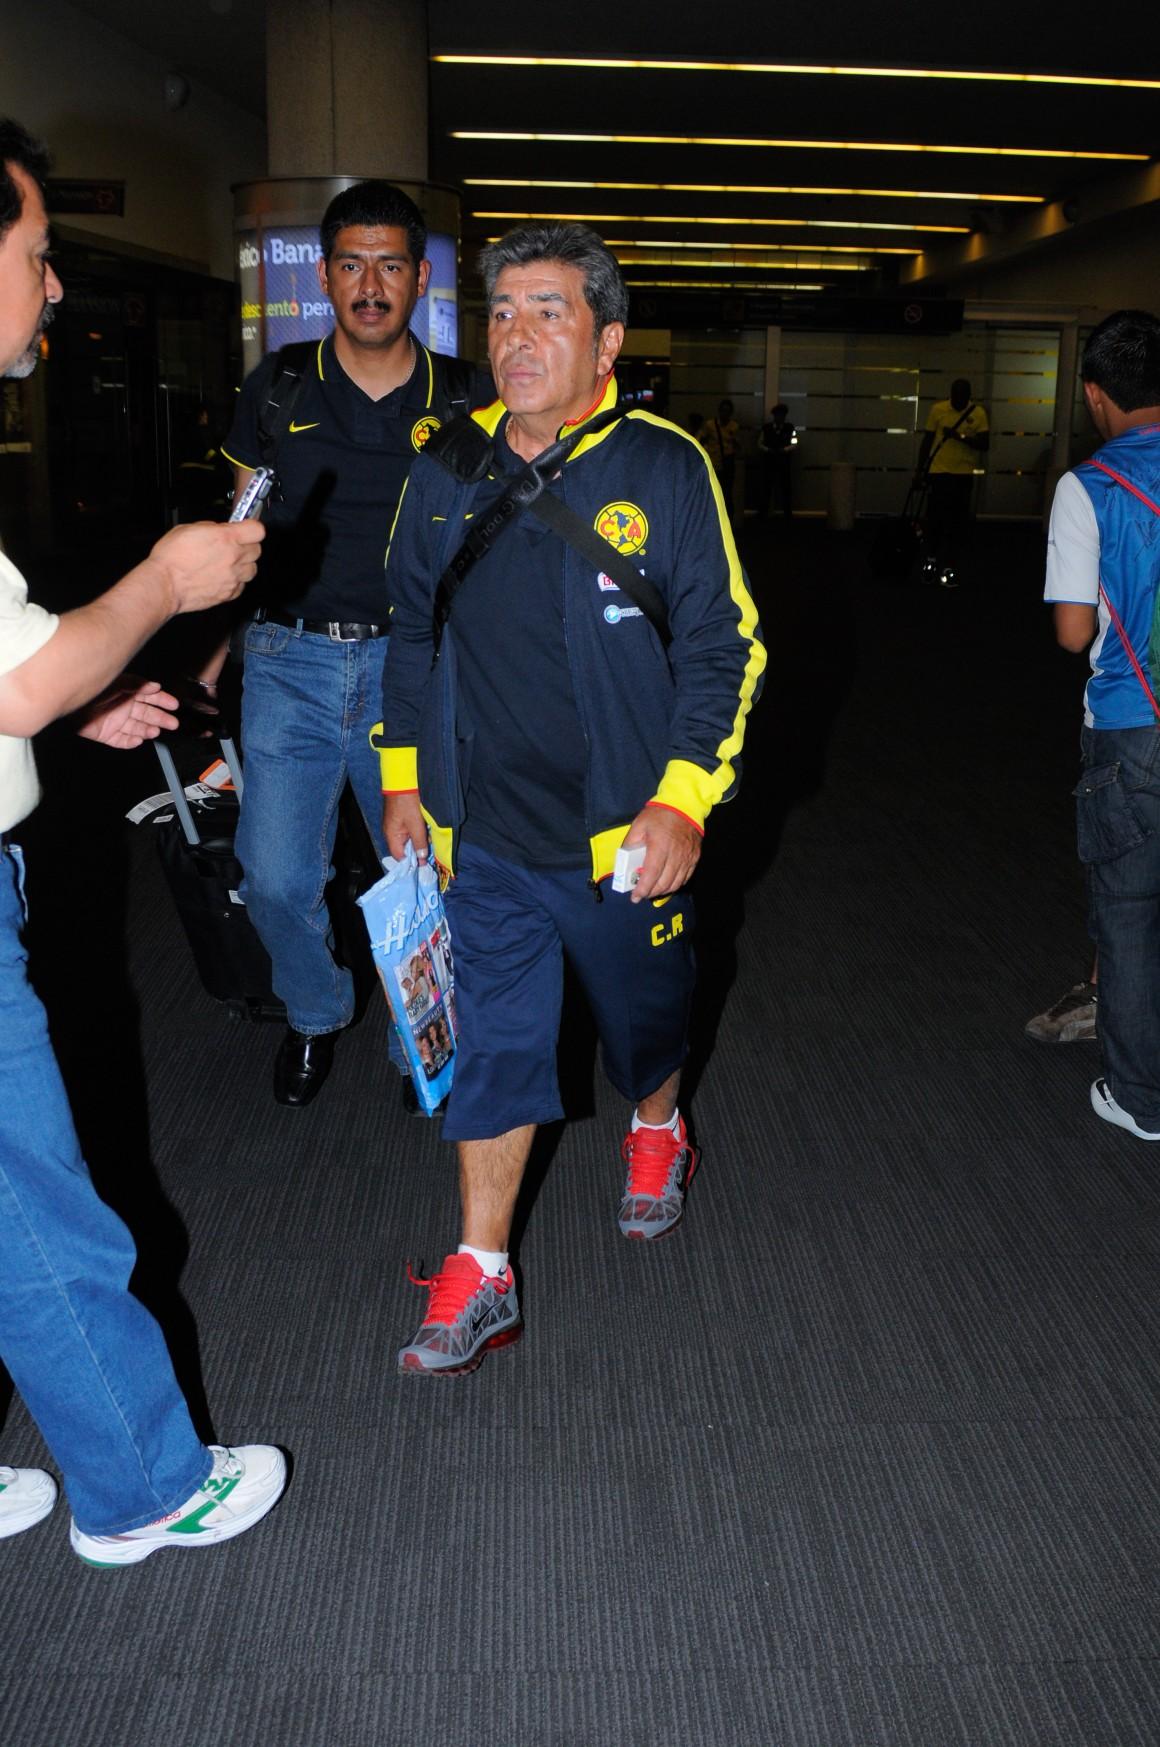 MƒXICO, D.F., 11ABRIL2011.- Anoche arrib— a la ciudad de MŽxico el club de futbol AmŽrica.FOTO: FRANCISCO RODRIGUEZ/CUARTOSCURO.COM